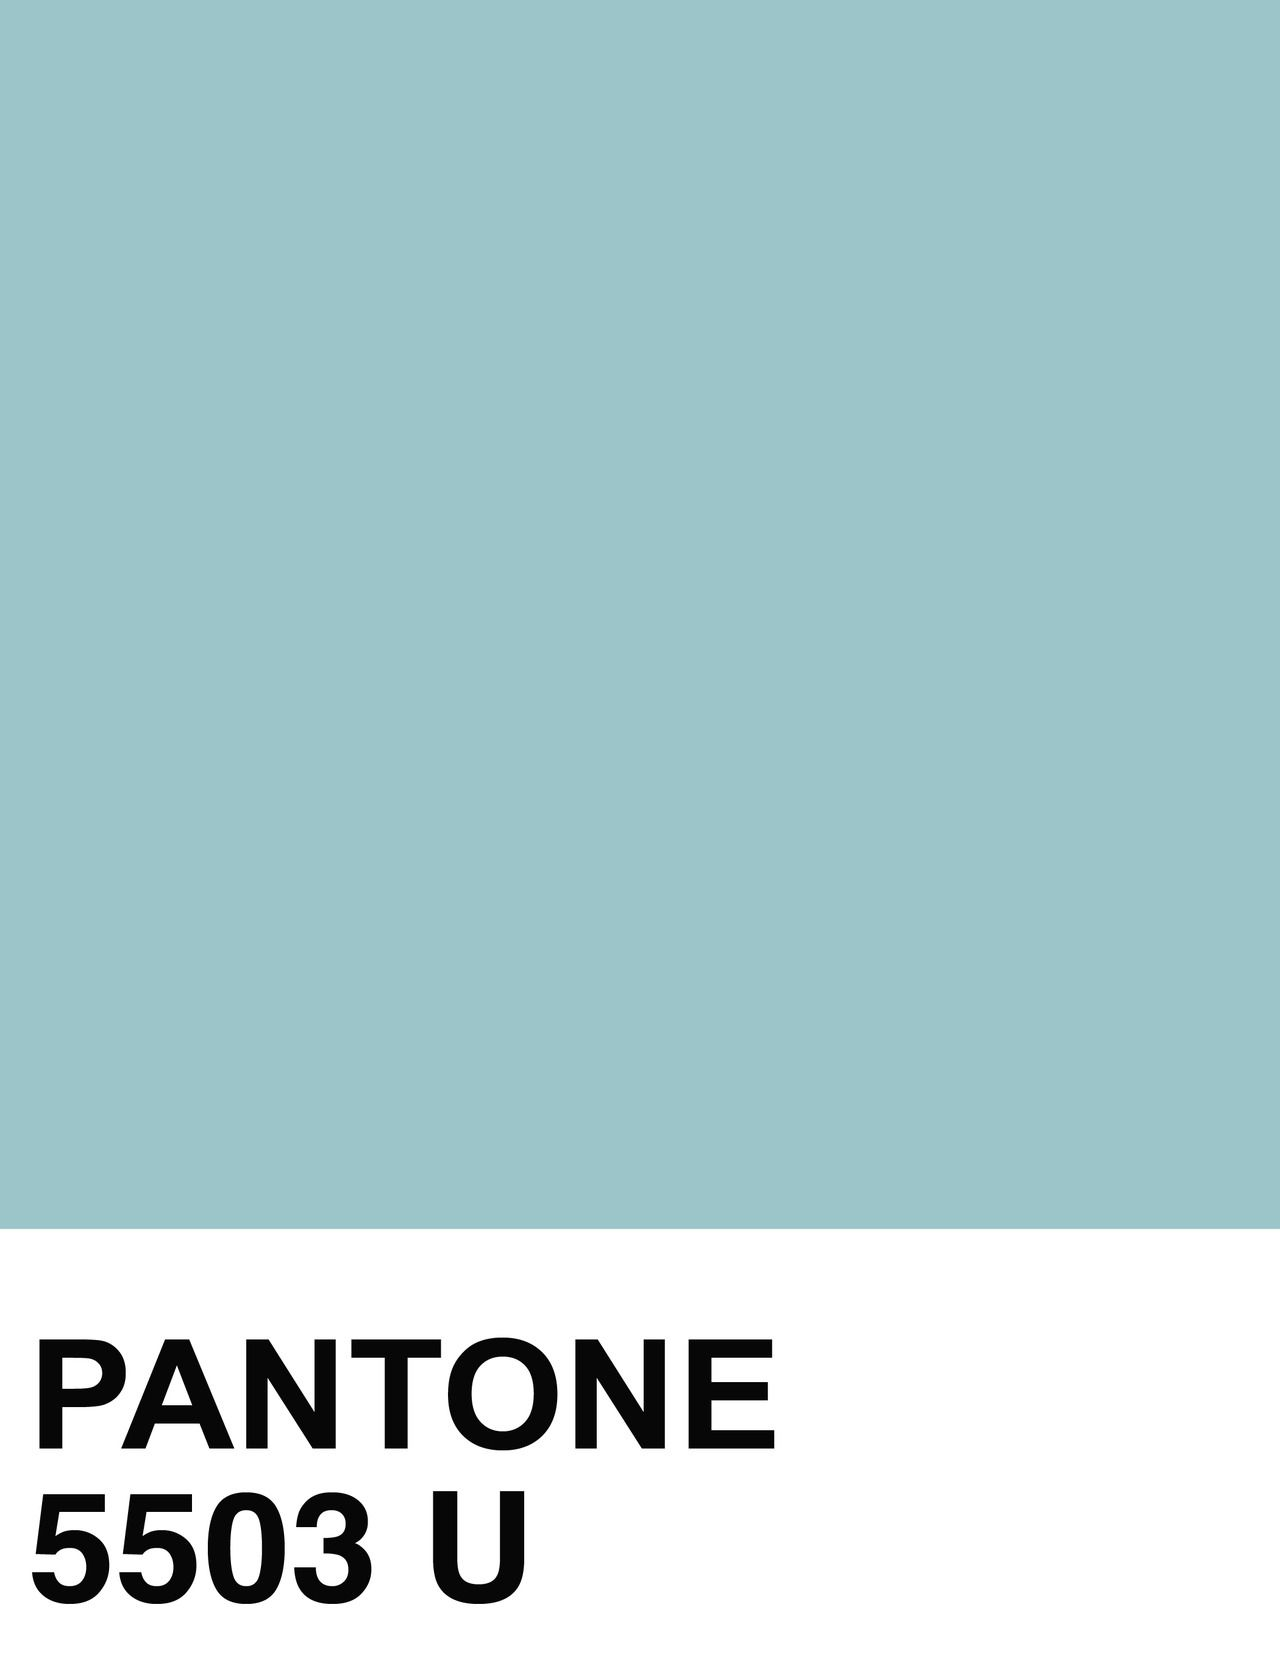 69e199c78bc pantone 5503 U Color Swatches